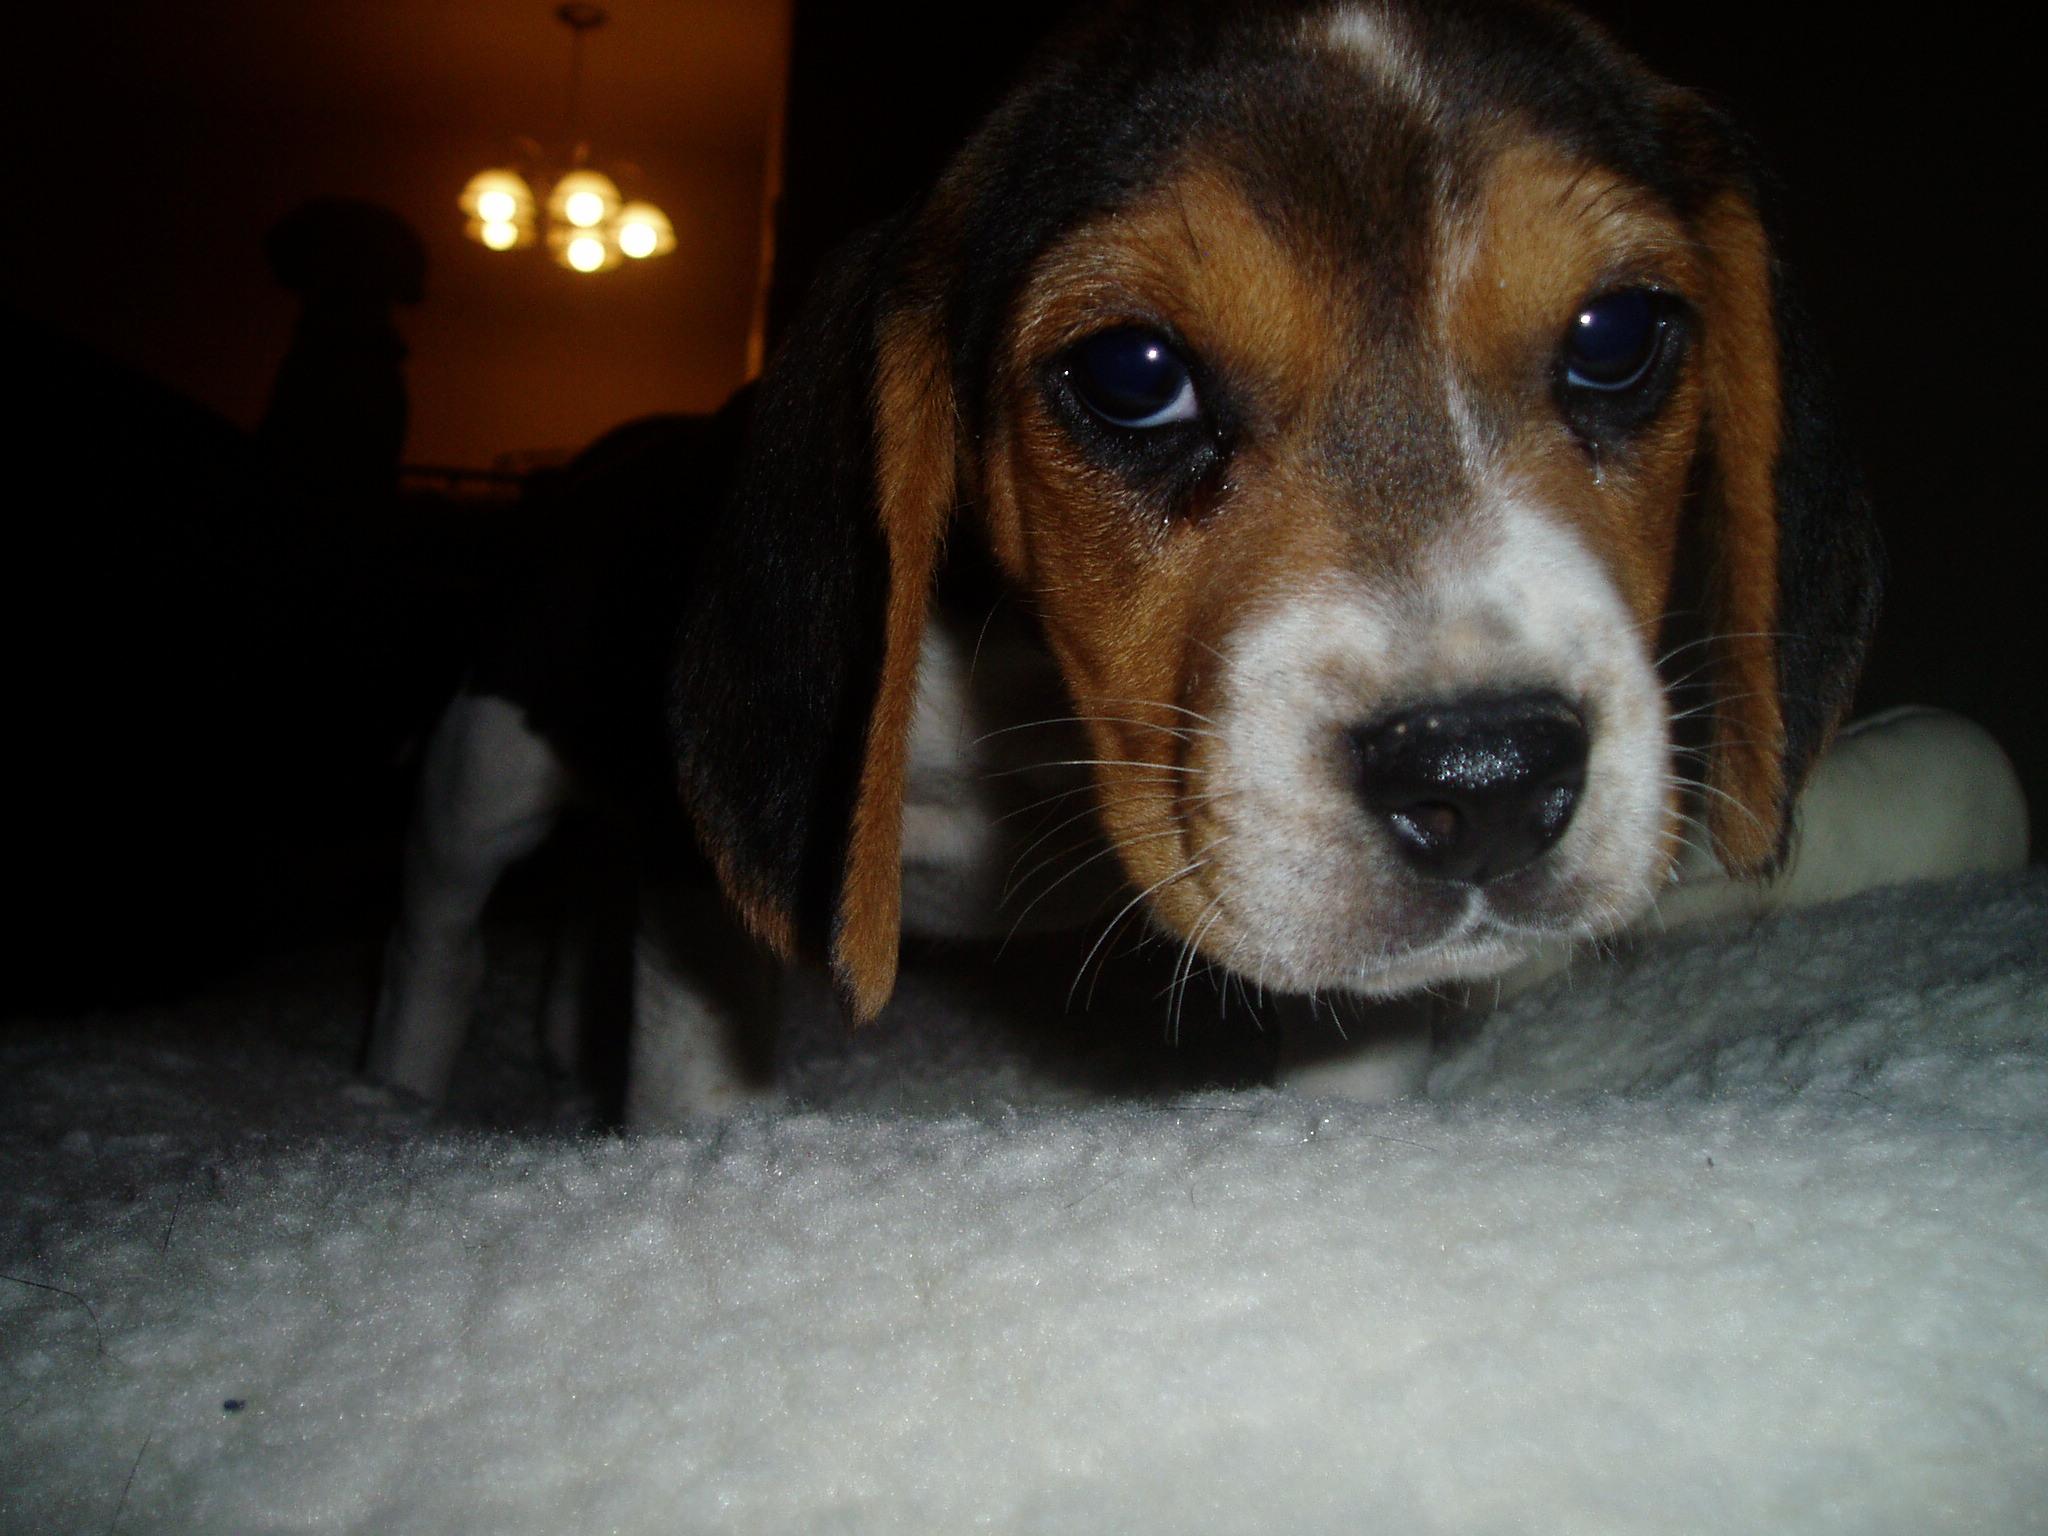 Meet Annabelle